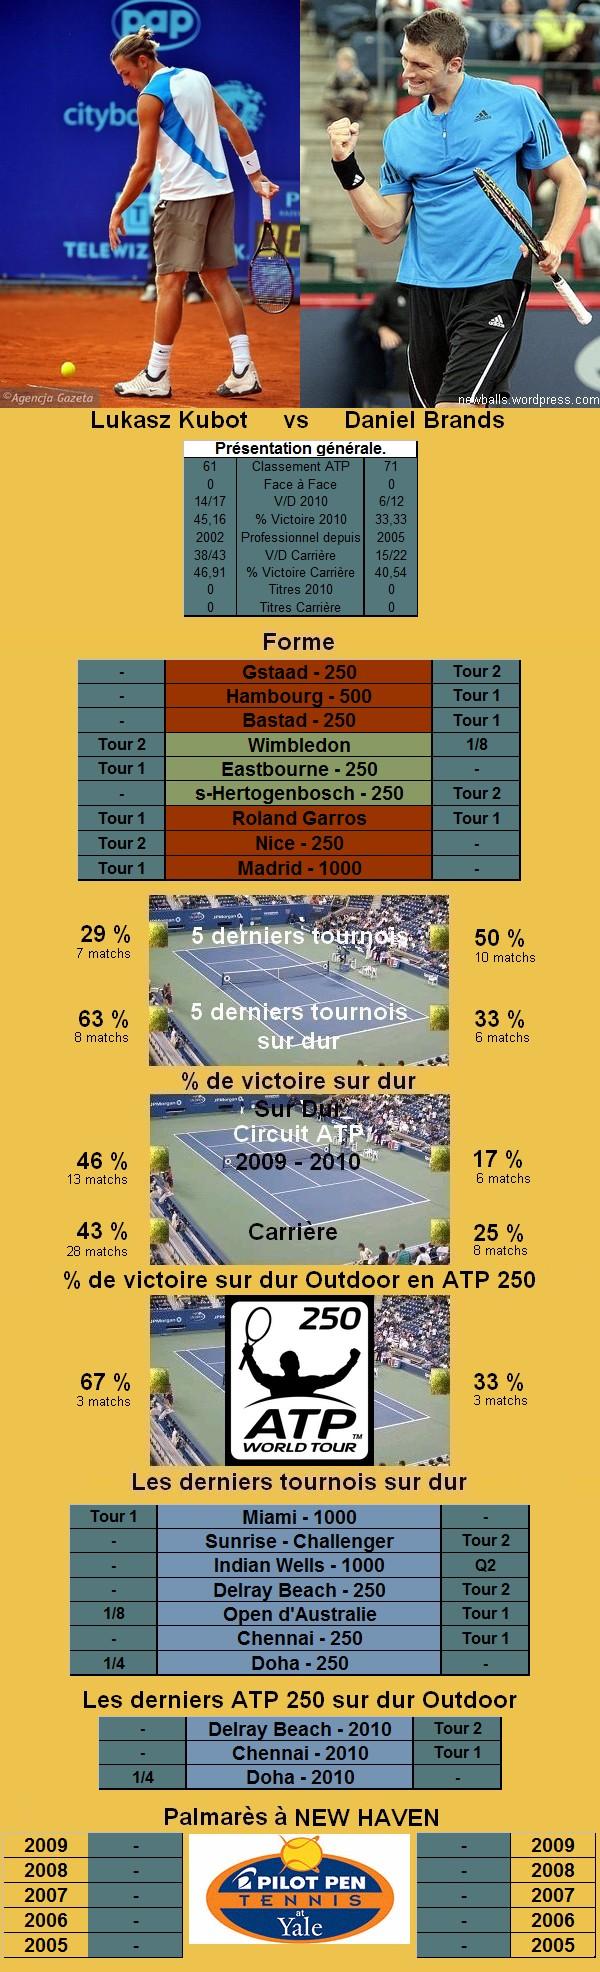 Statistiques tennis de Kubot contre Brands à New Haven